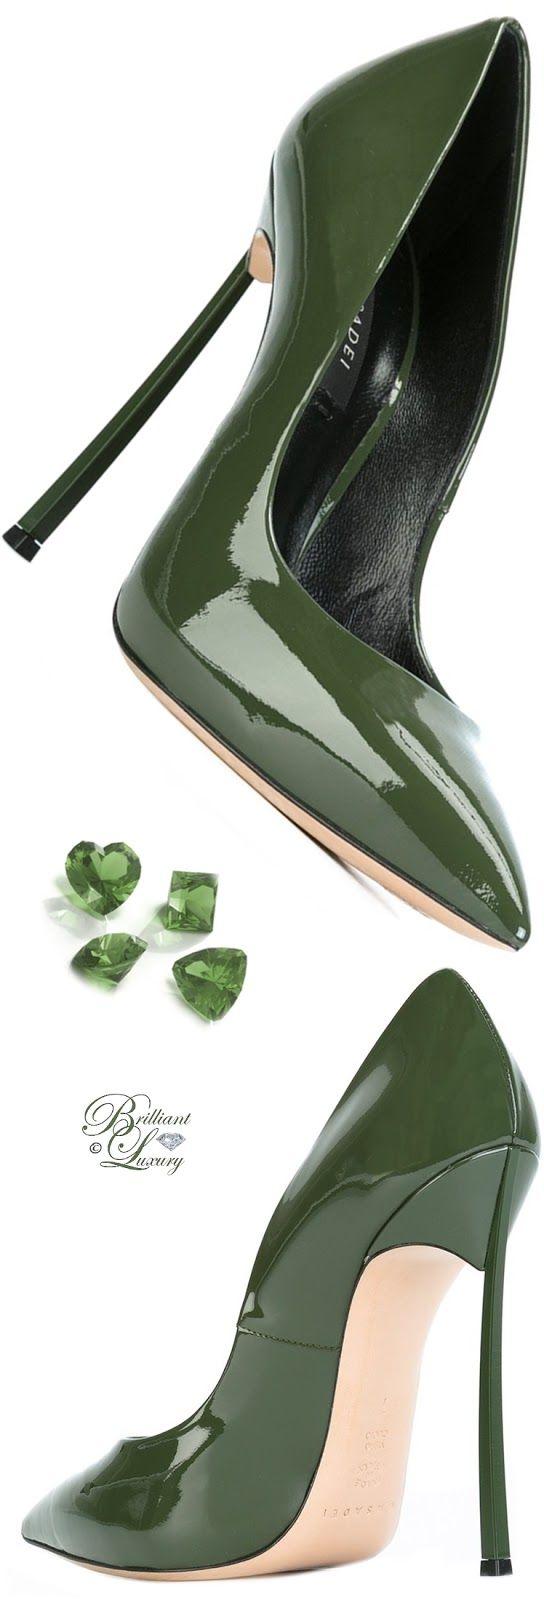 Brilliant Luxury by Emmy DE ♦ Casadei Stiletto Heel Pumps